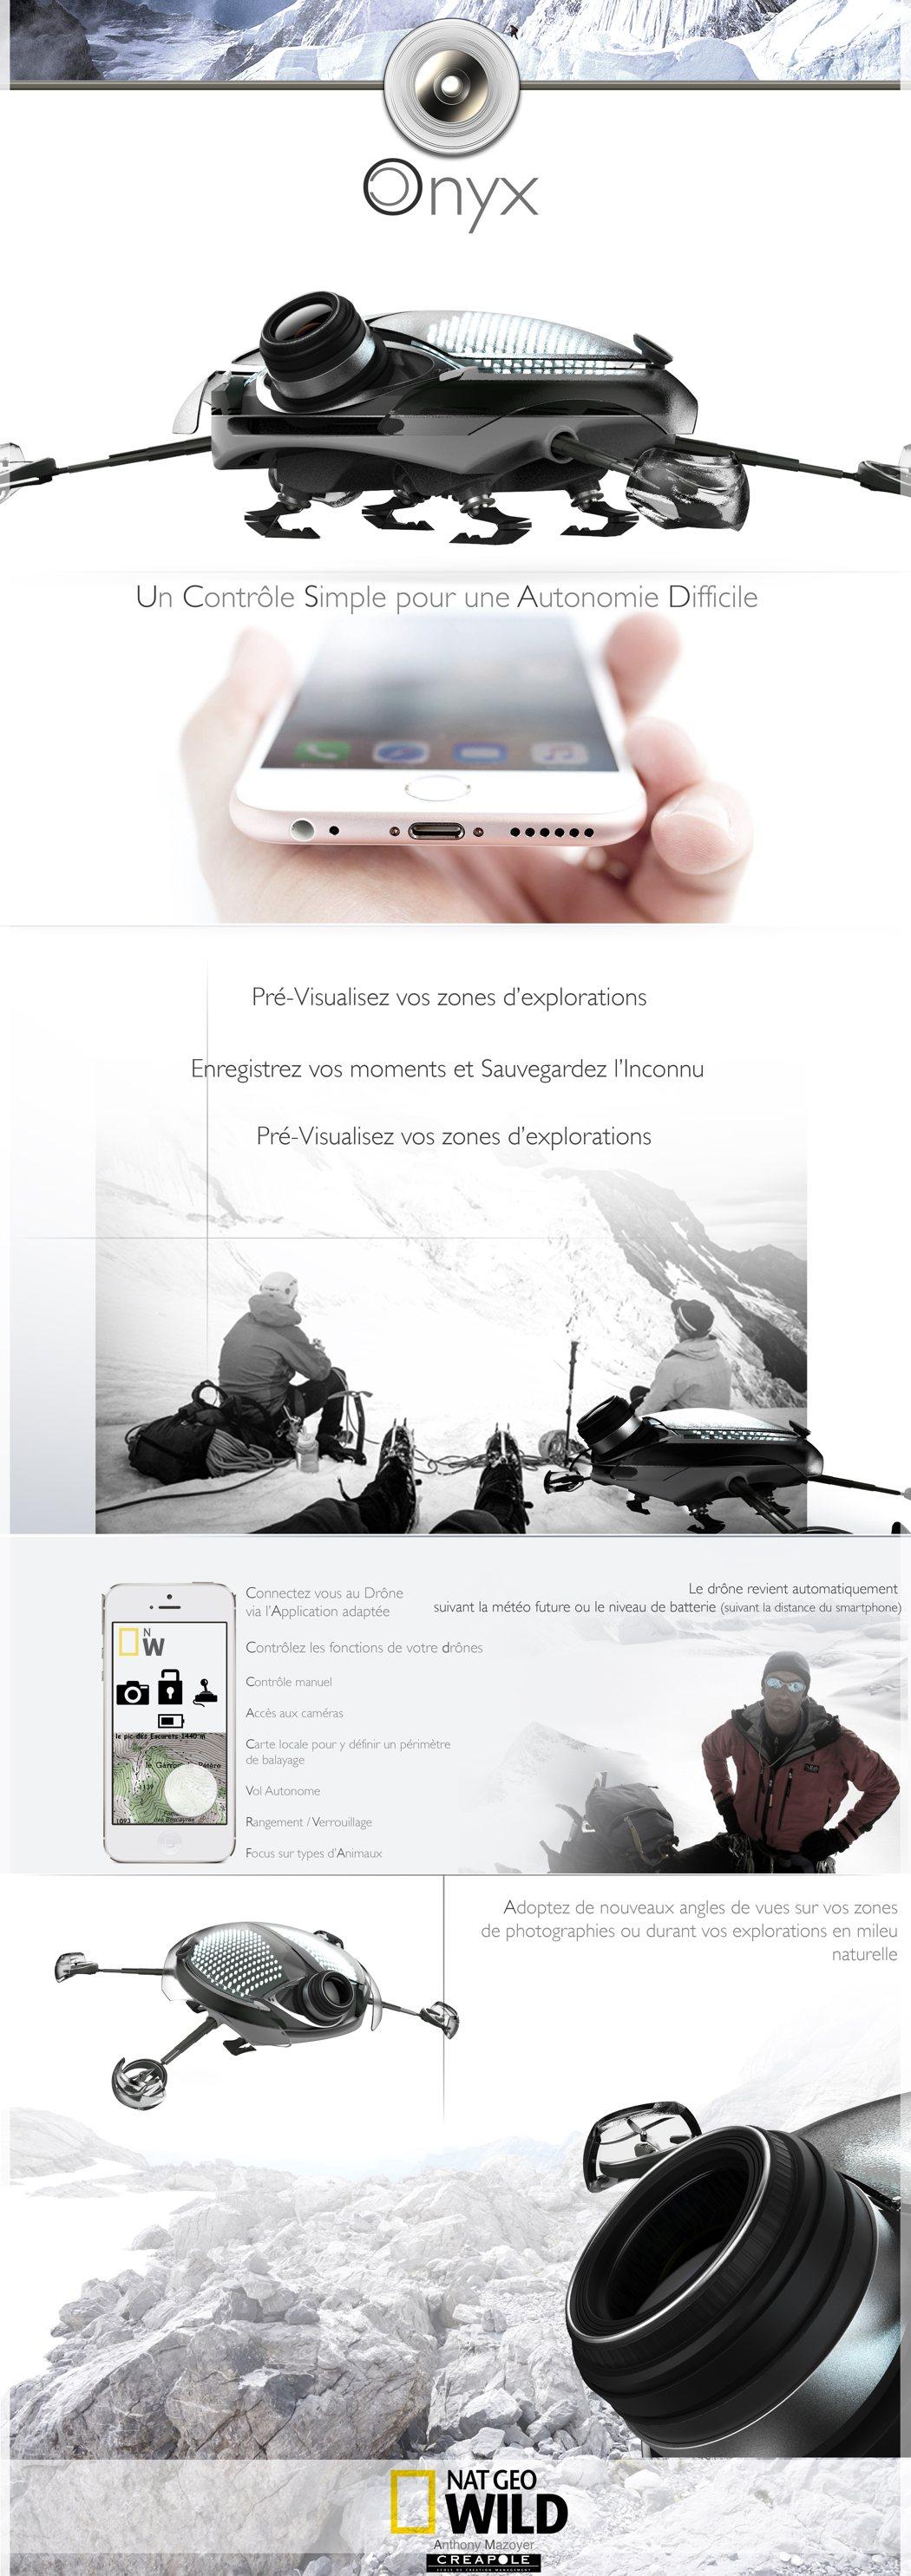 drone_onyx3